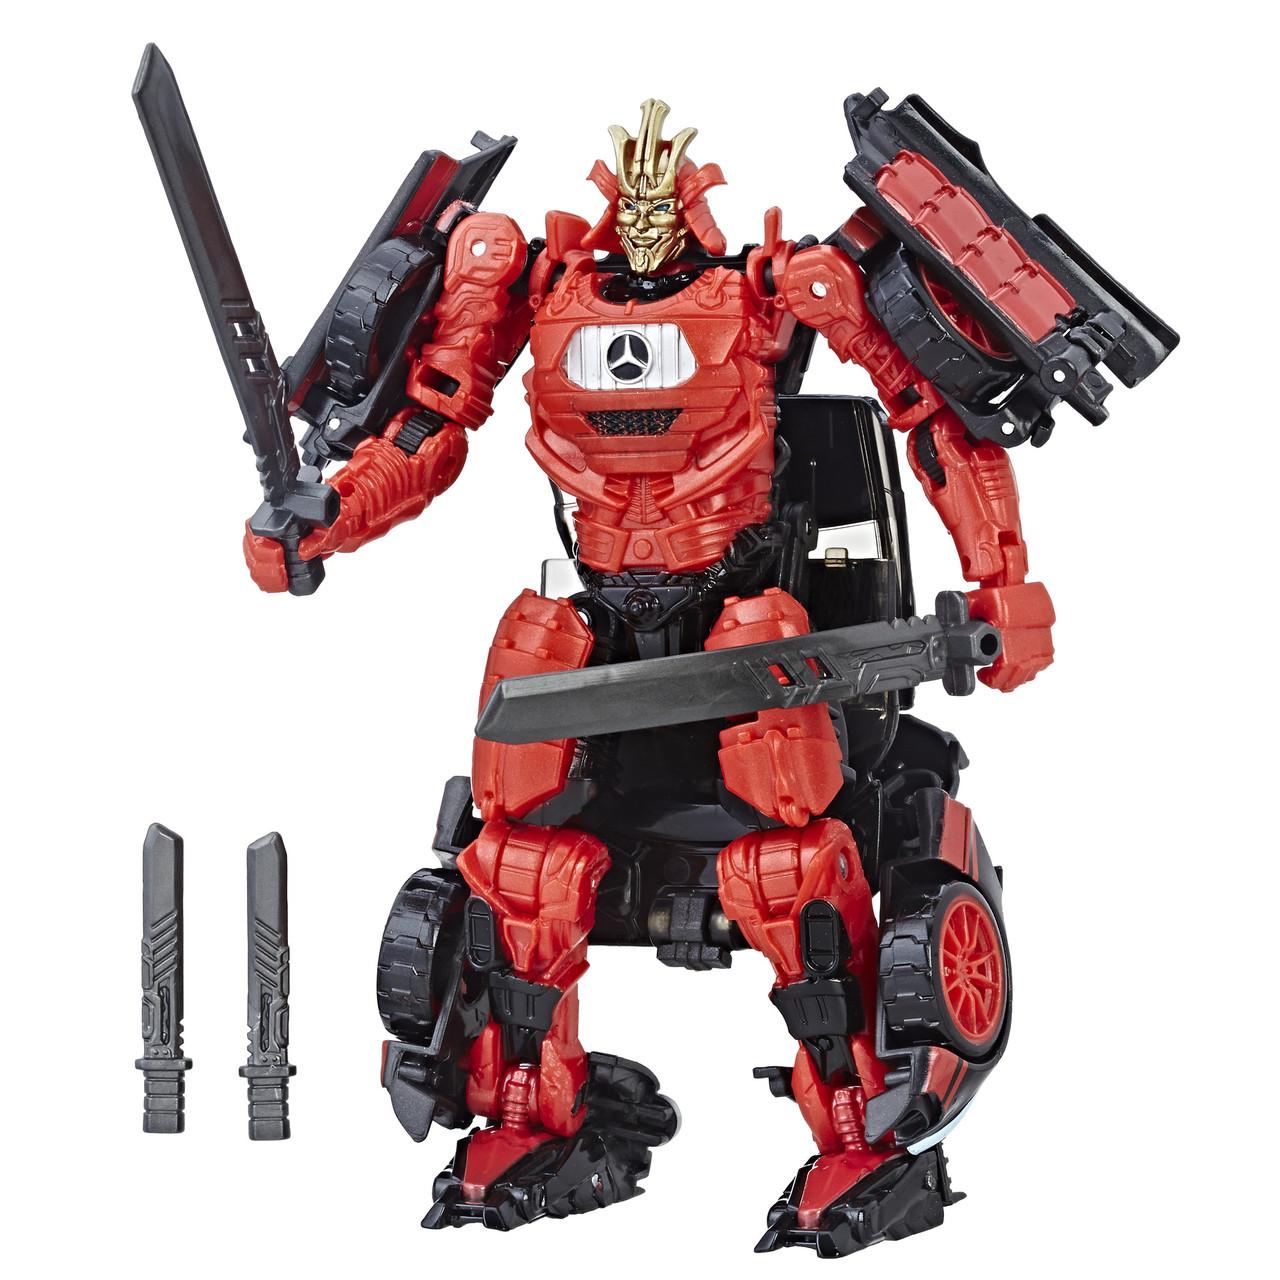 Transformers 5 Делюкс Autobot Drift  Останній рицарь (Трансформер 5 Последний рыцарь Делюкс Автобот Дрифт)